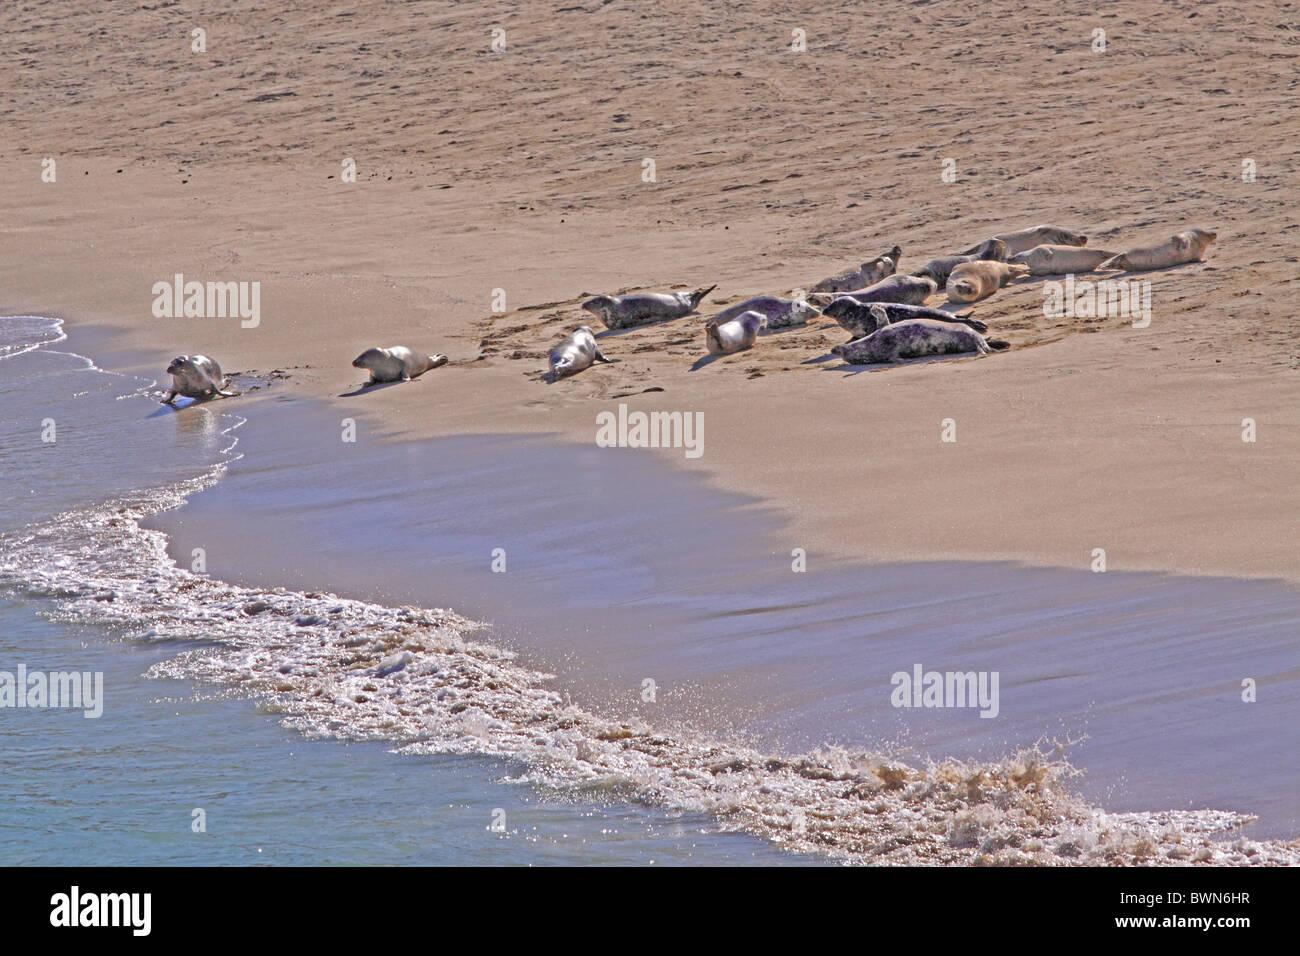 UK Scotland Common Seals on hebridean Island beach - Stock Image